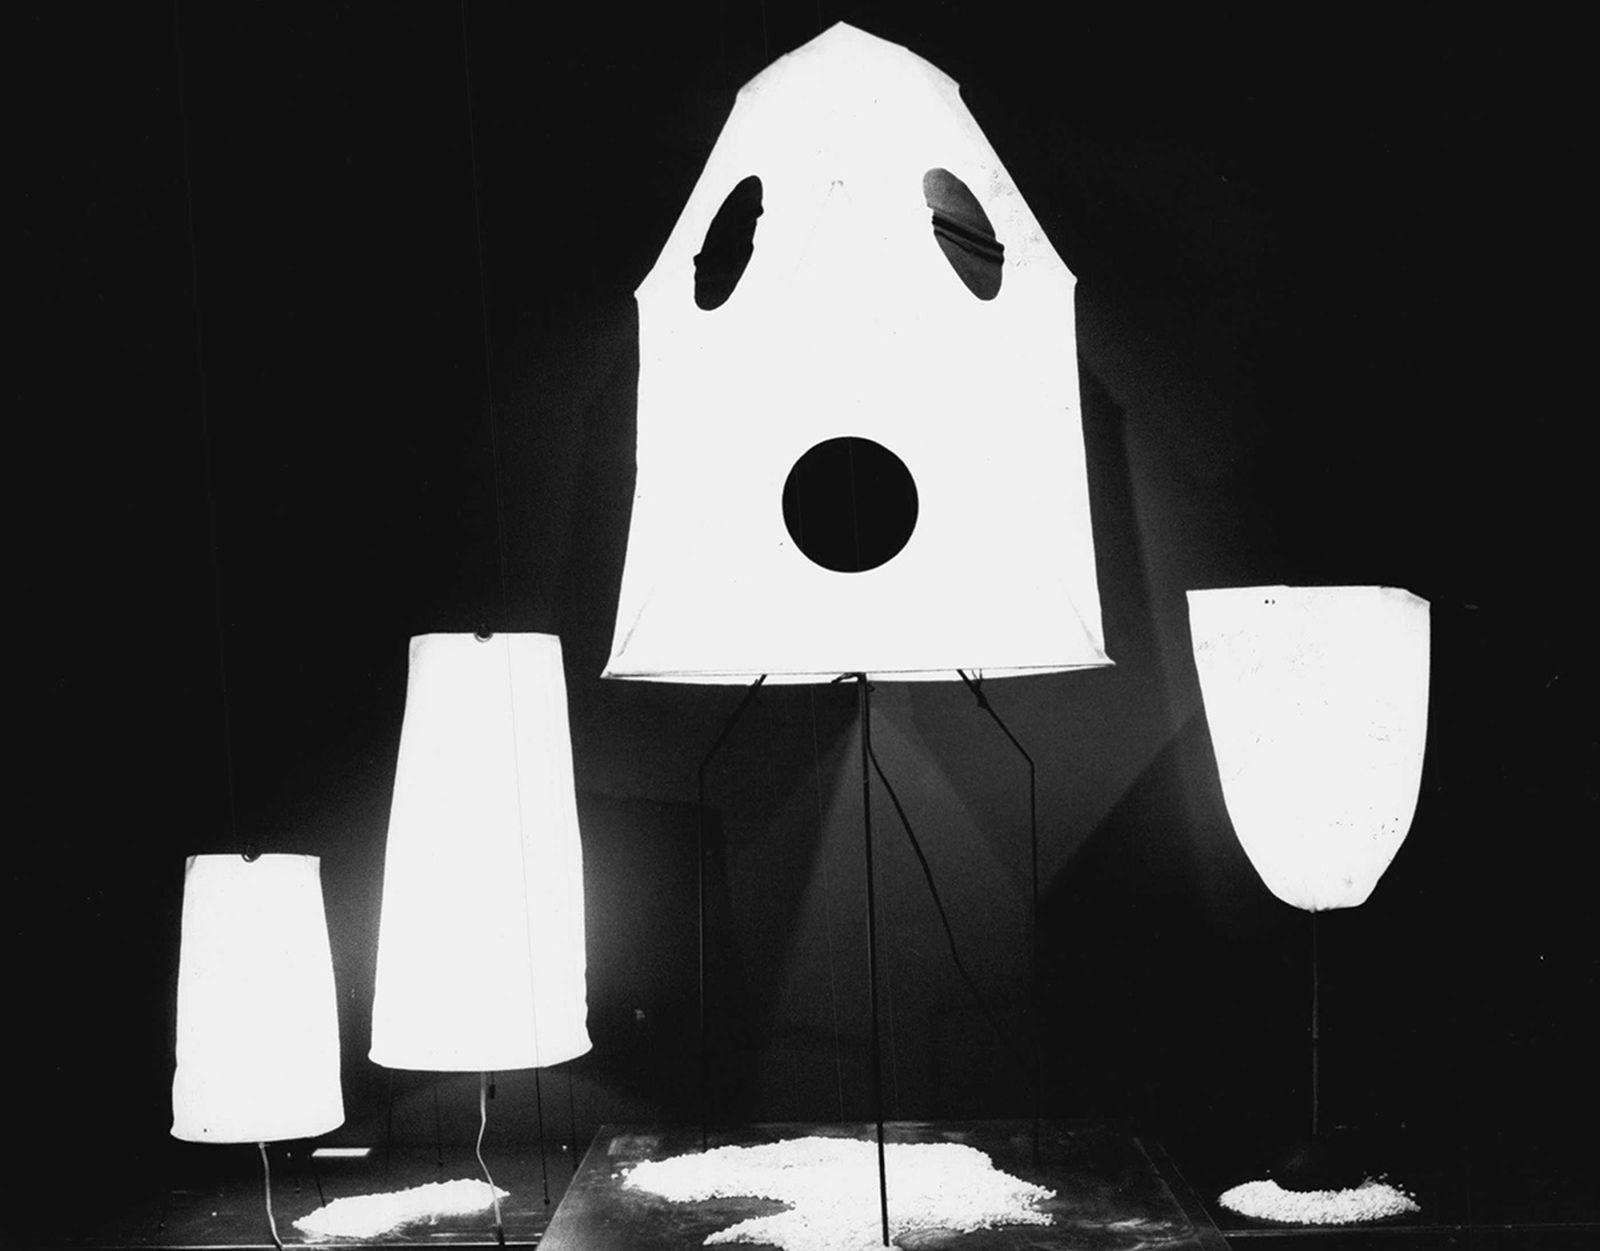 ode-noguchi-akari-lamp-mid-century-lighting-grail-ages-03